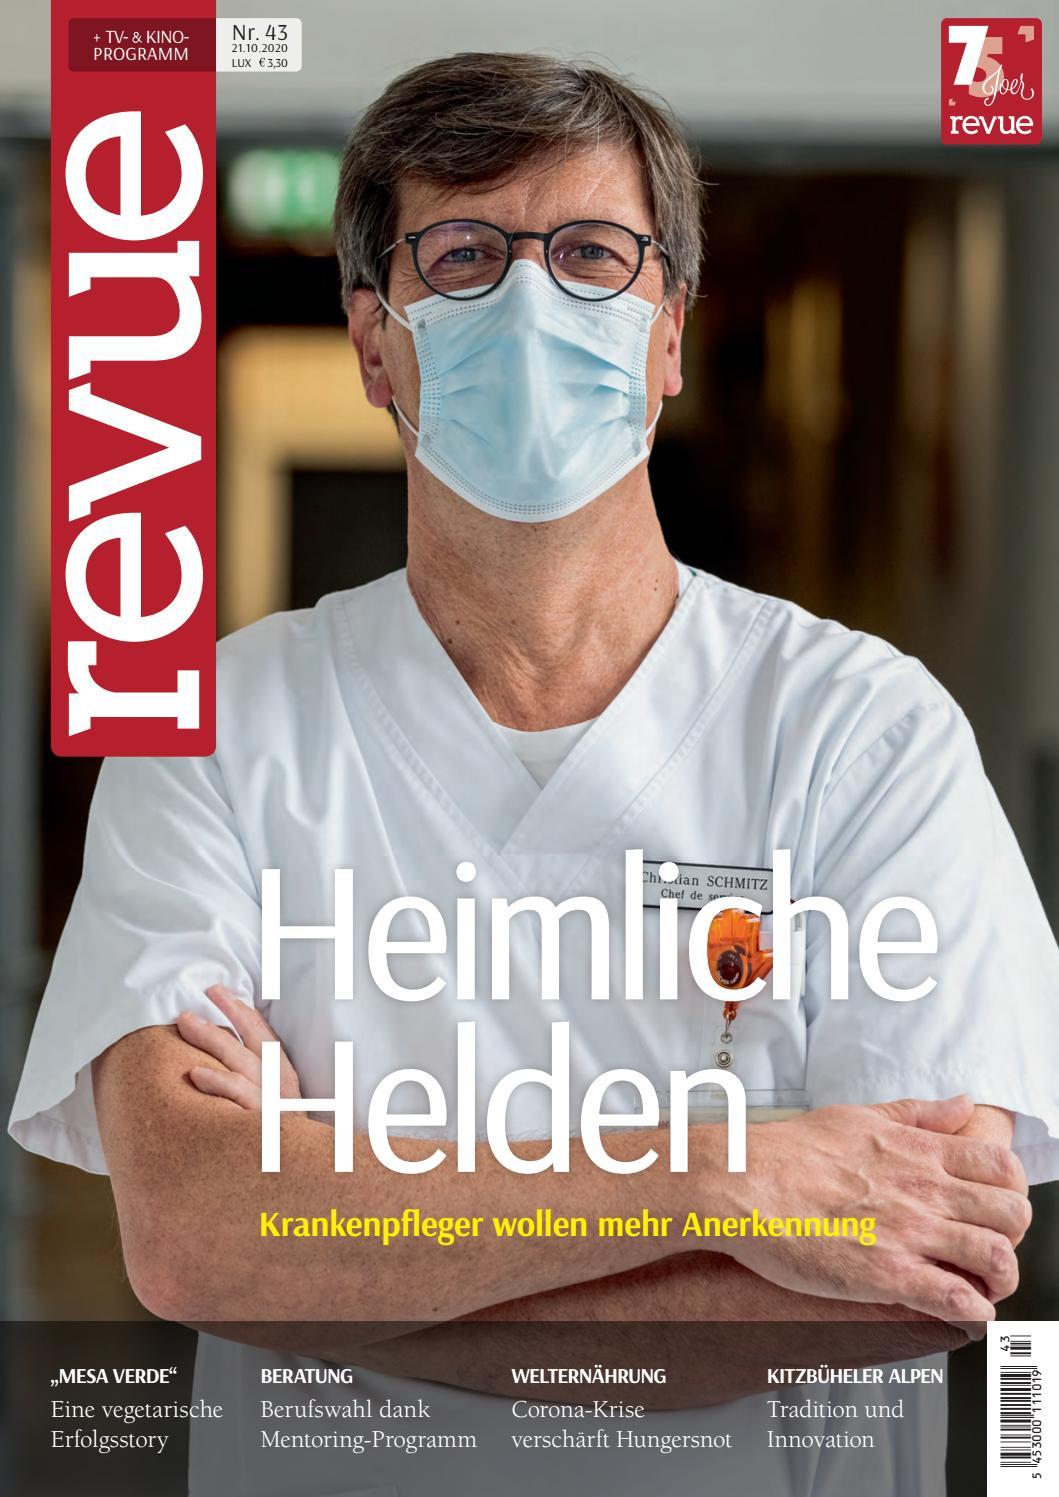 revue 2020 43 by revue de magazin fir